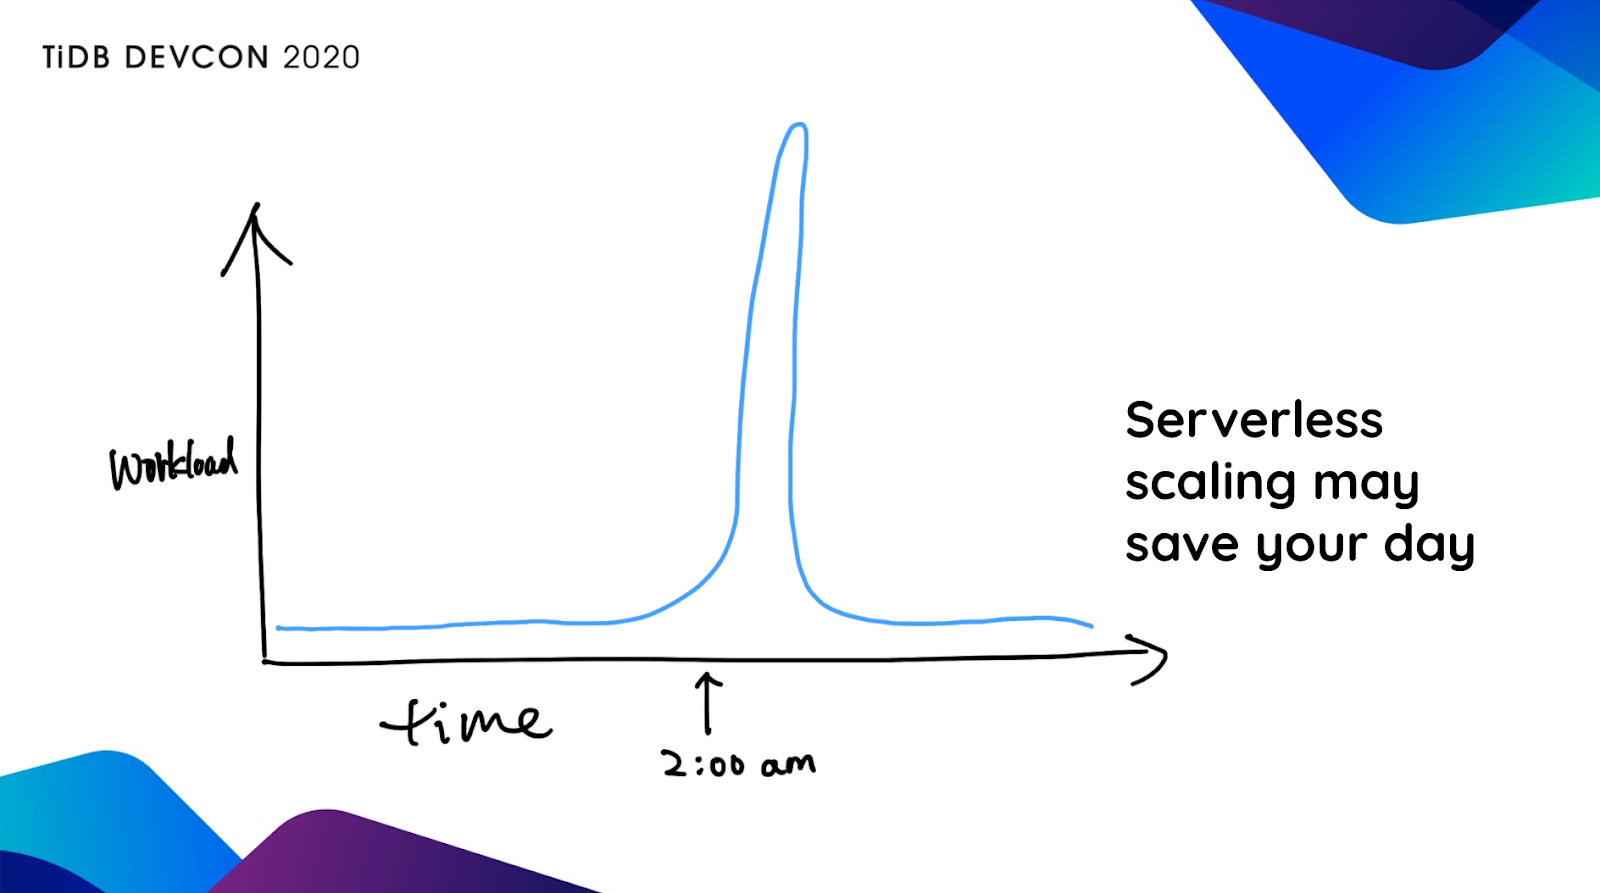 Serverless scaling